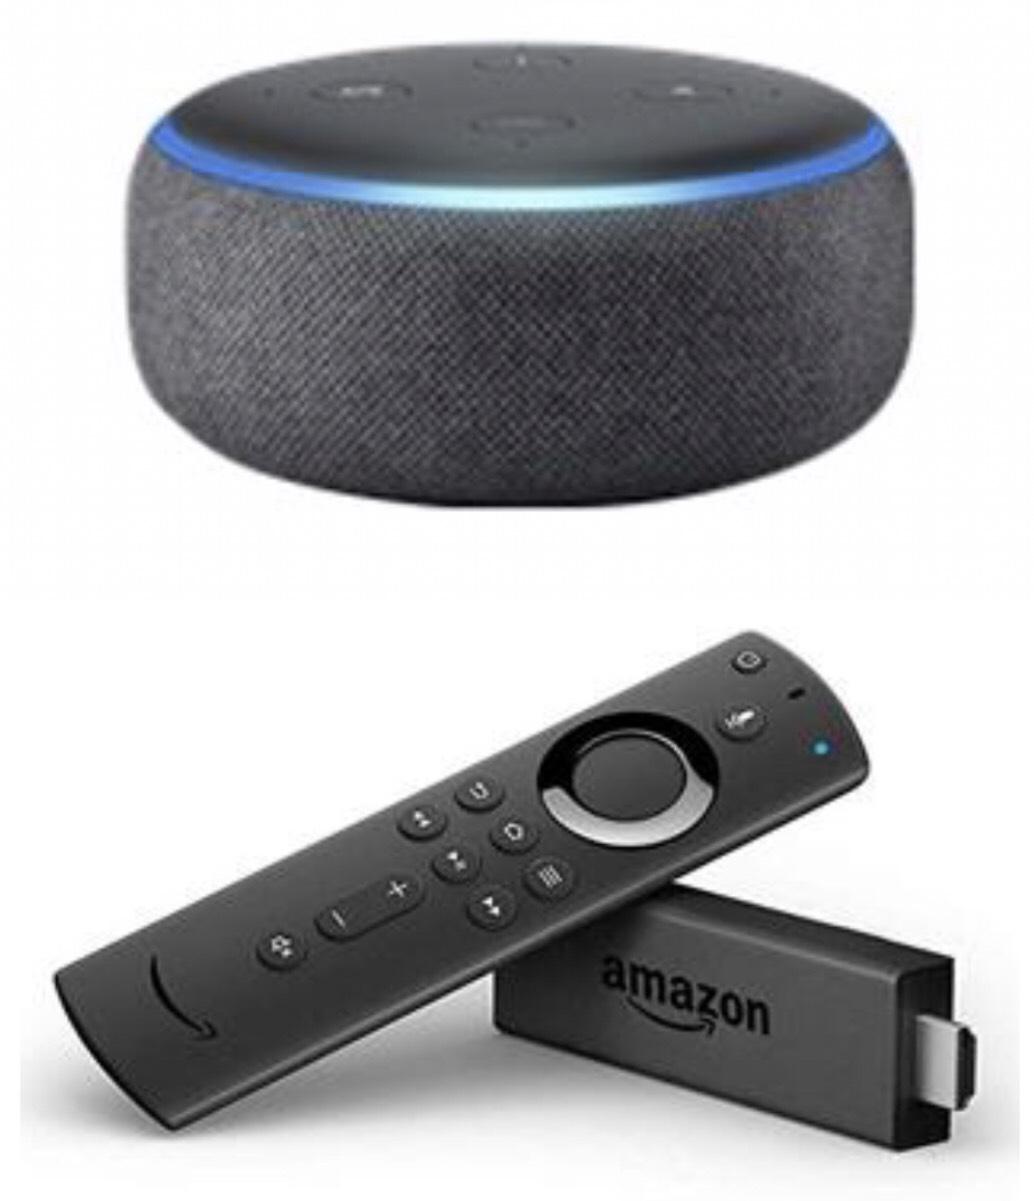 Amazon Echo Dot (3rd Gen) - (Charcoal) + Fire TV Stick with New Alexa Remote £49.98 @ BT SHOP